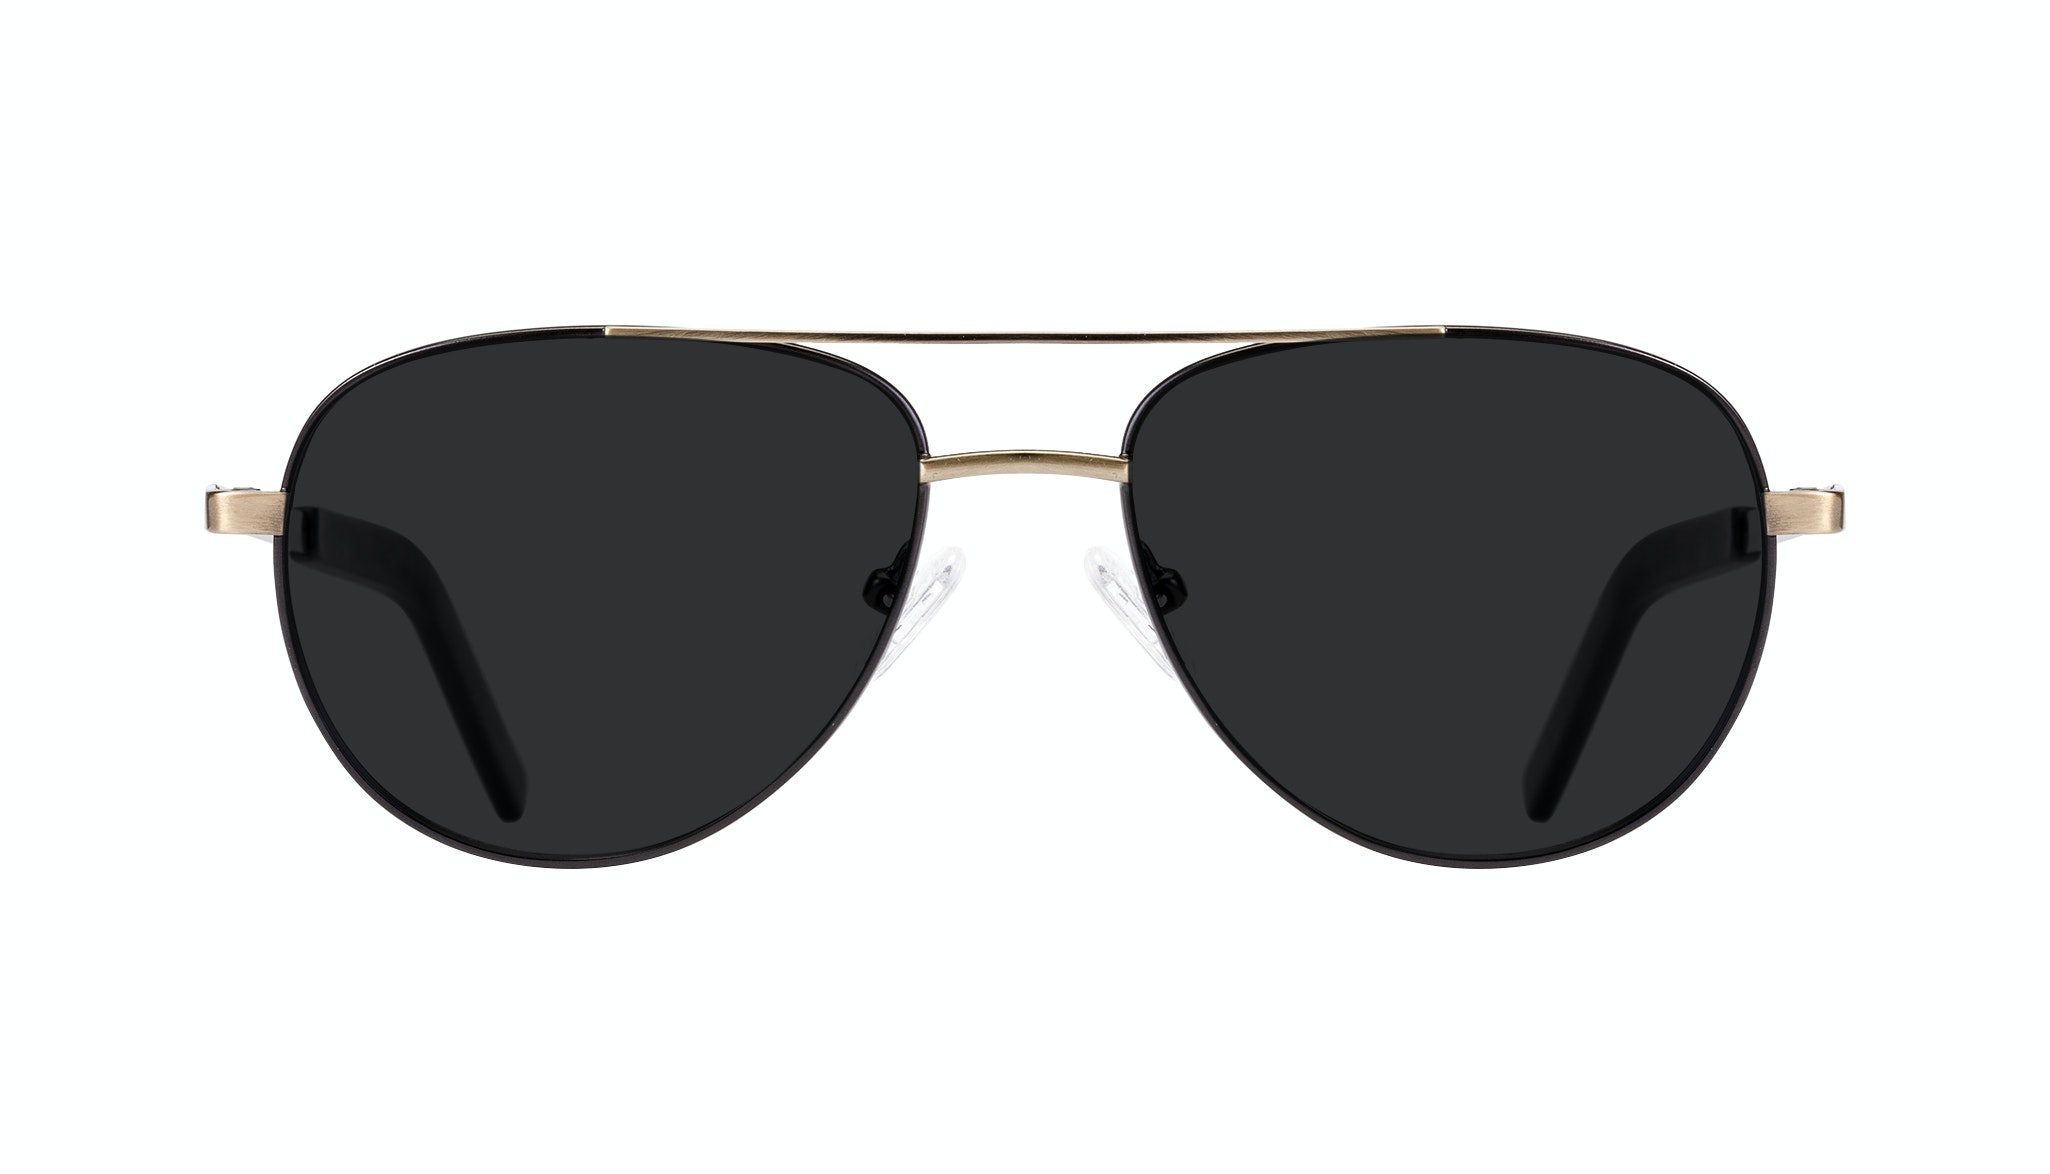 Affordable Fashion Glasses Aviator Sunglasses Men Devoted Deep Gold